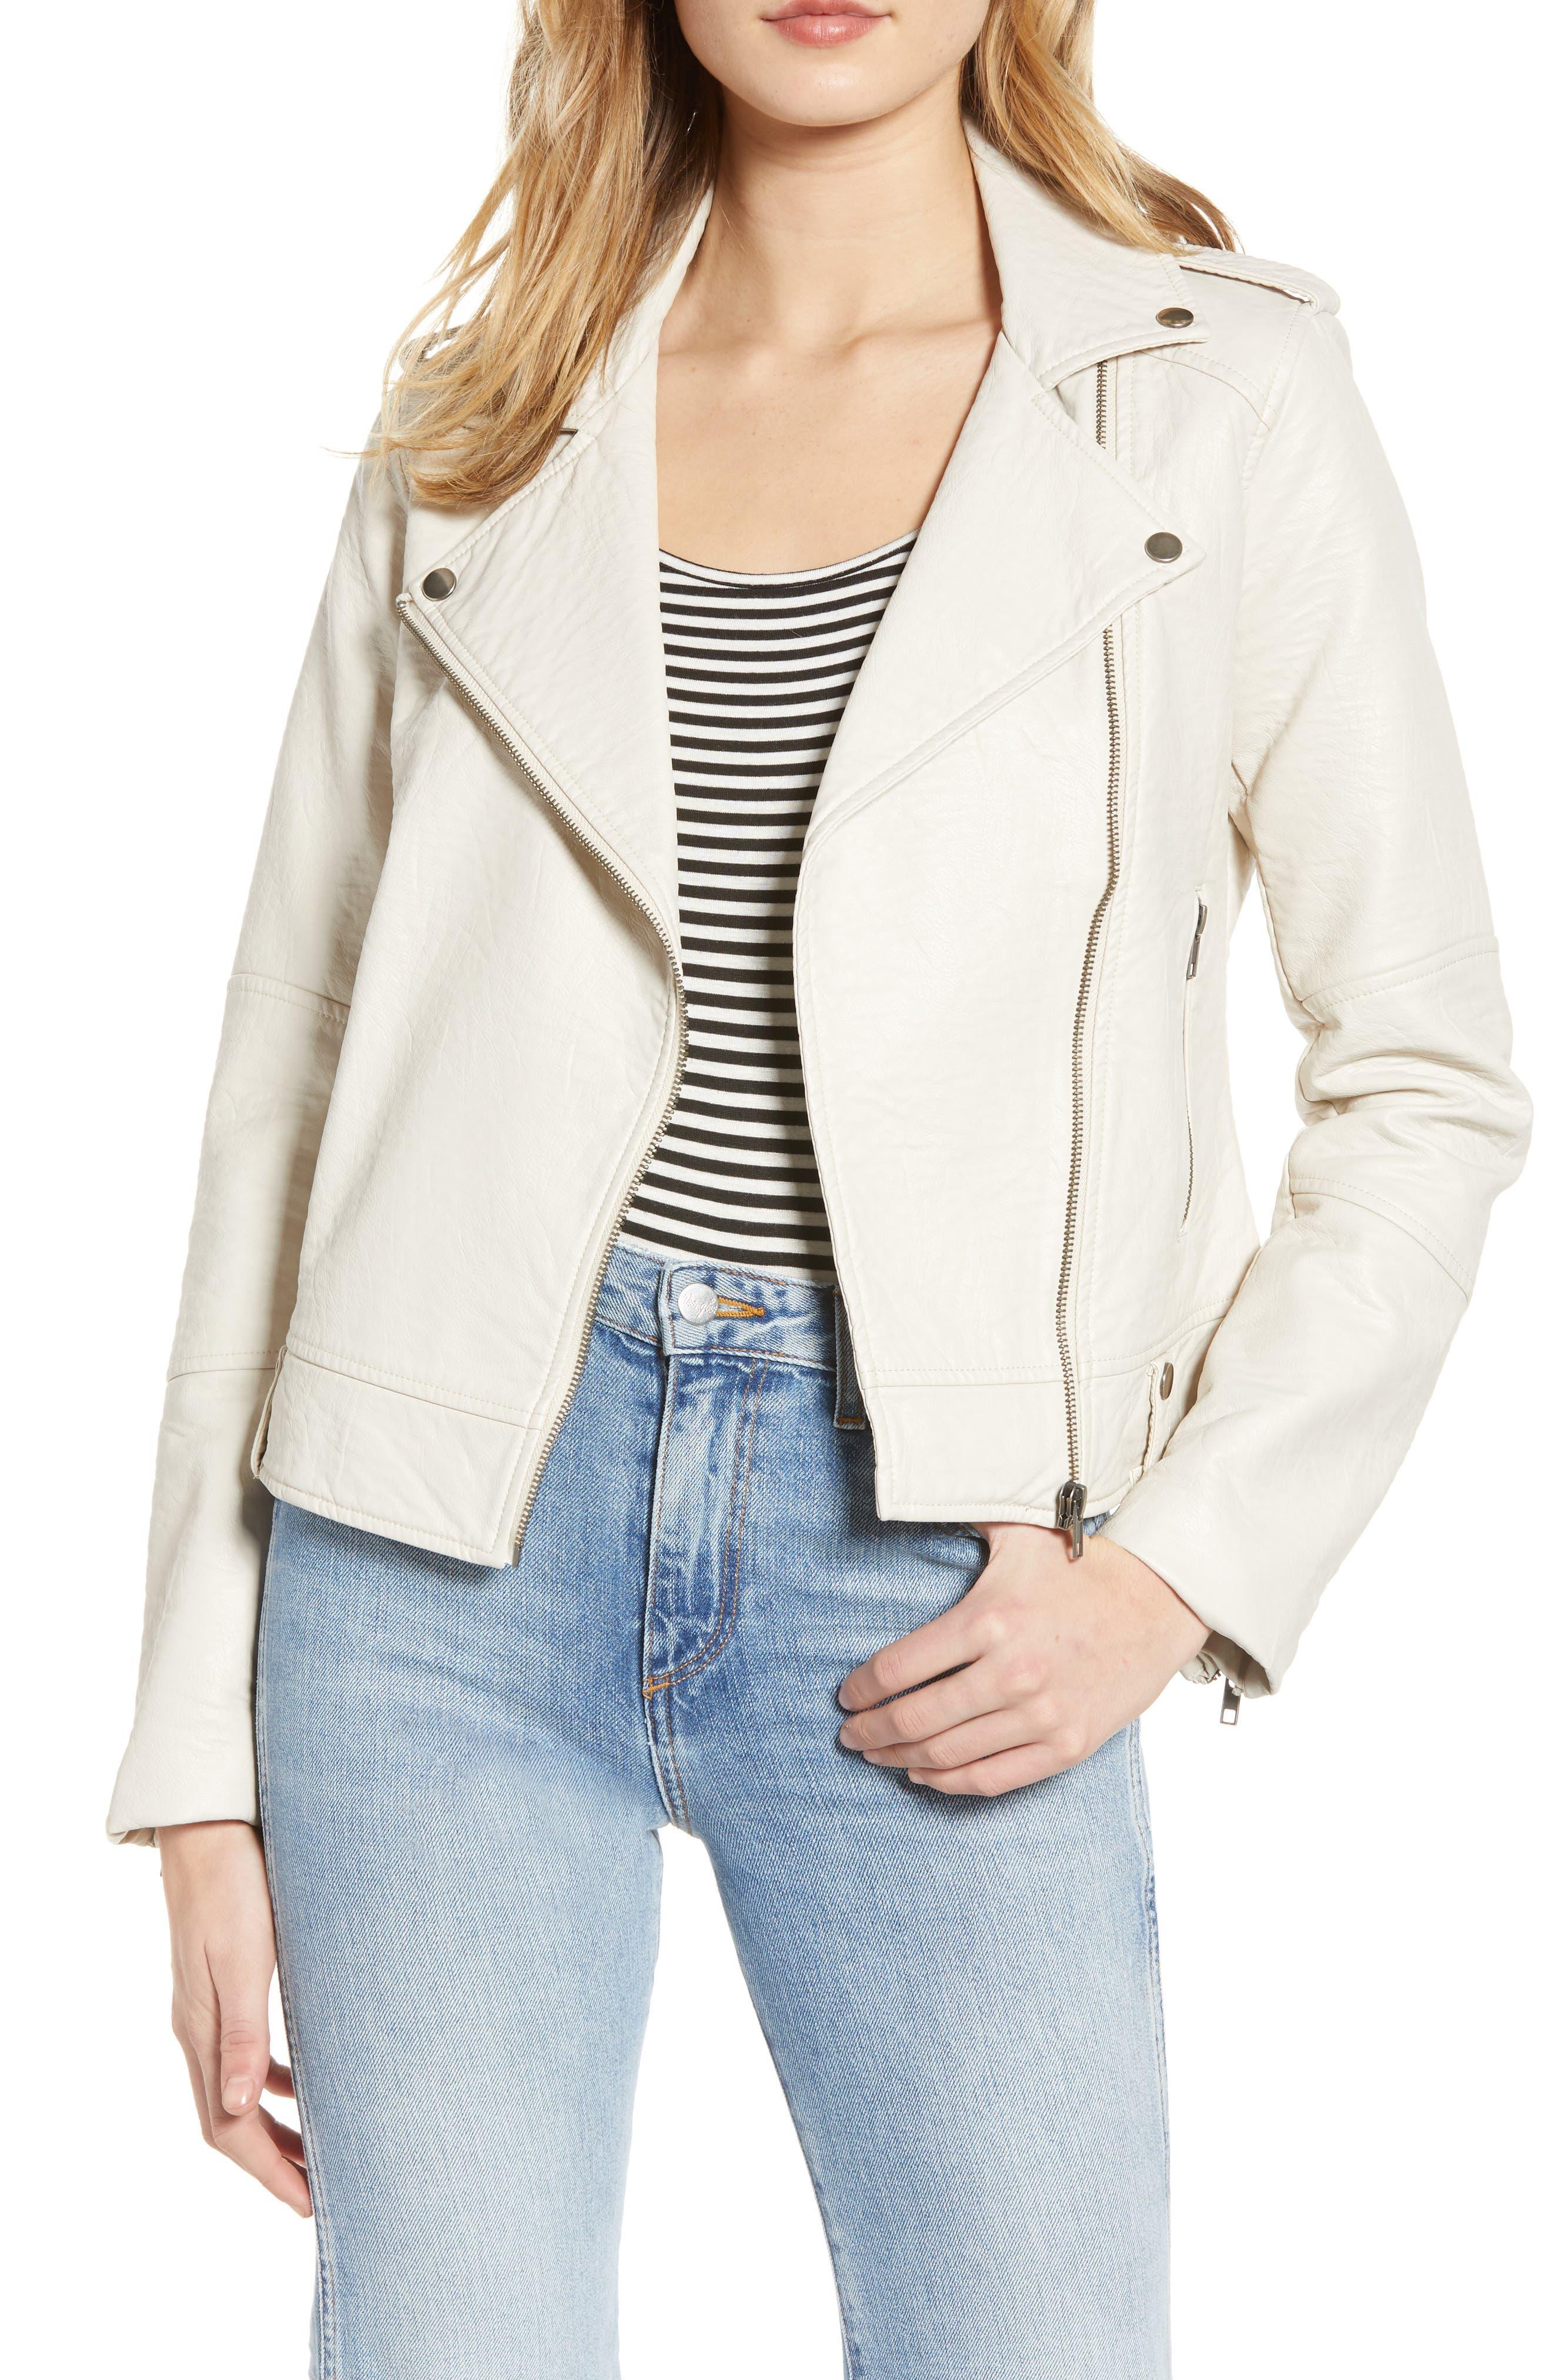 CUPCAKES AND CASHMERE Vivica Faux Leather Jacket, Main, color, BONE